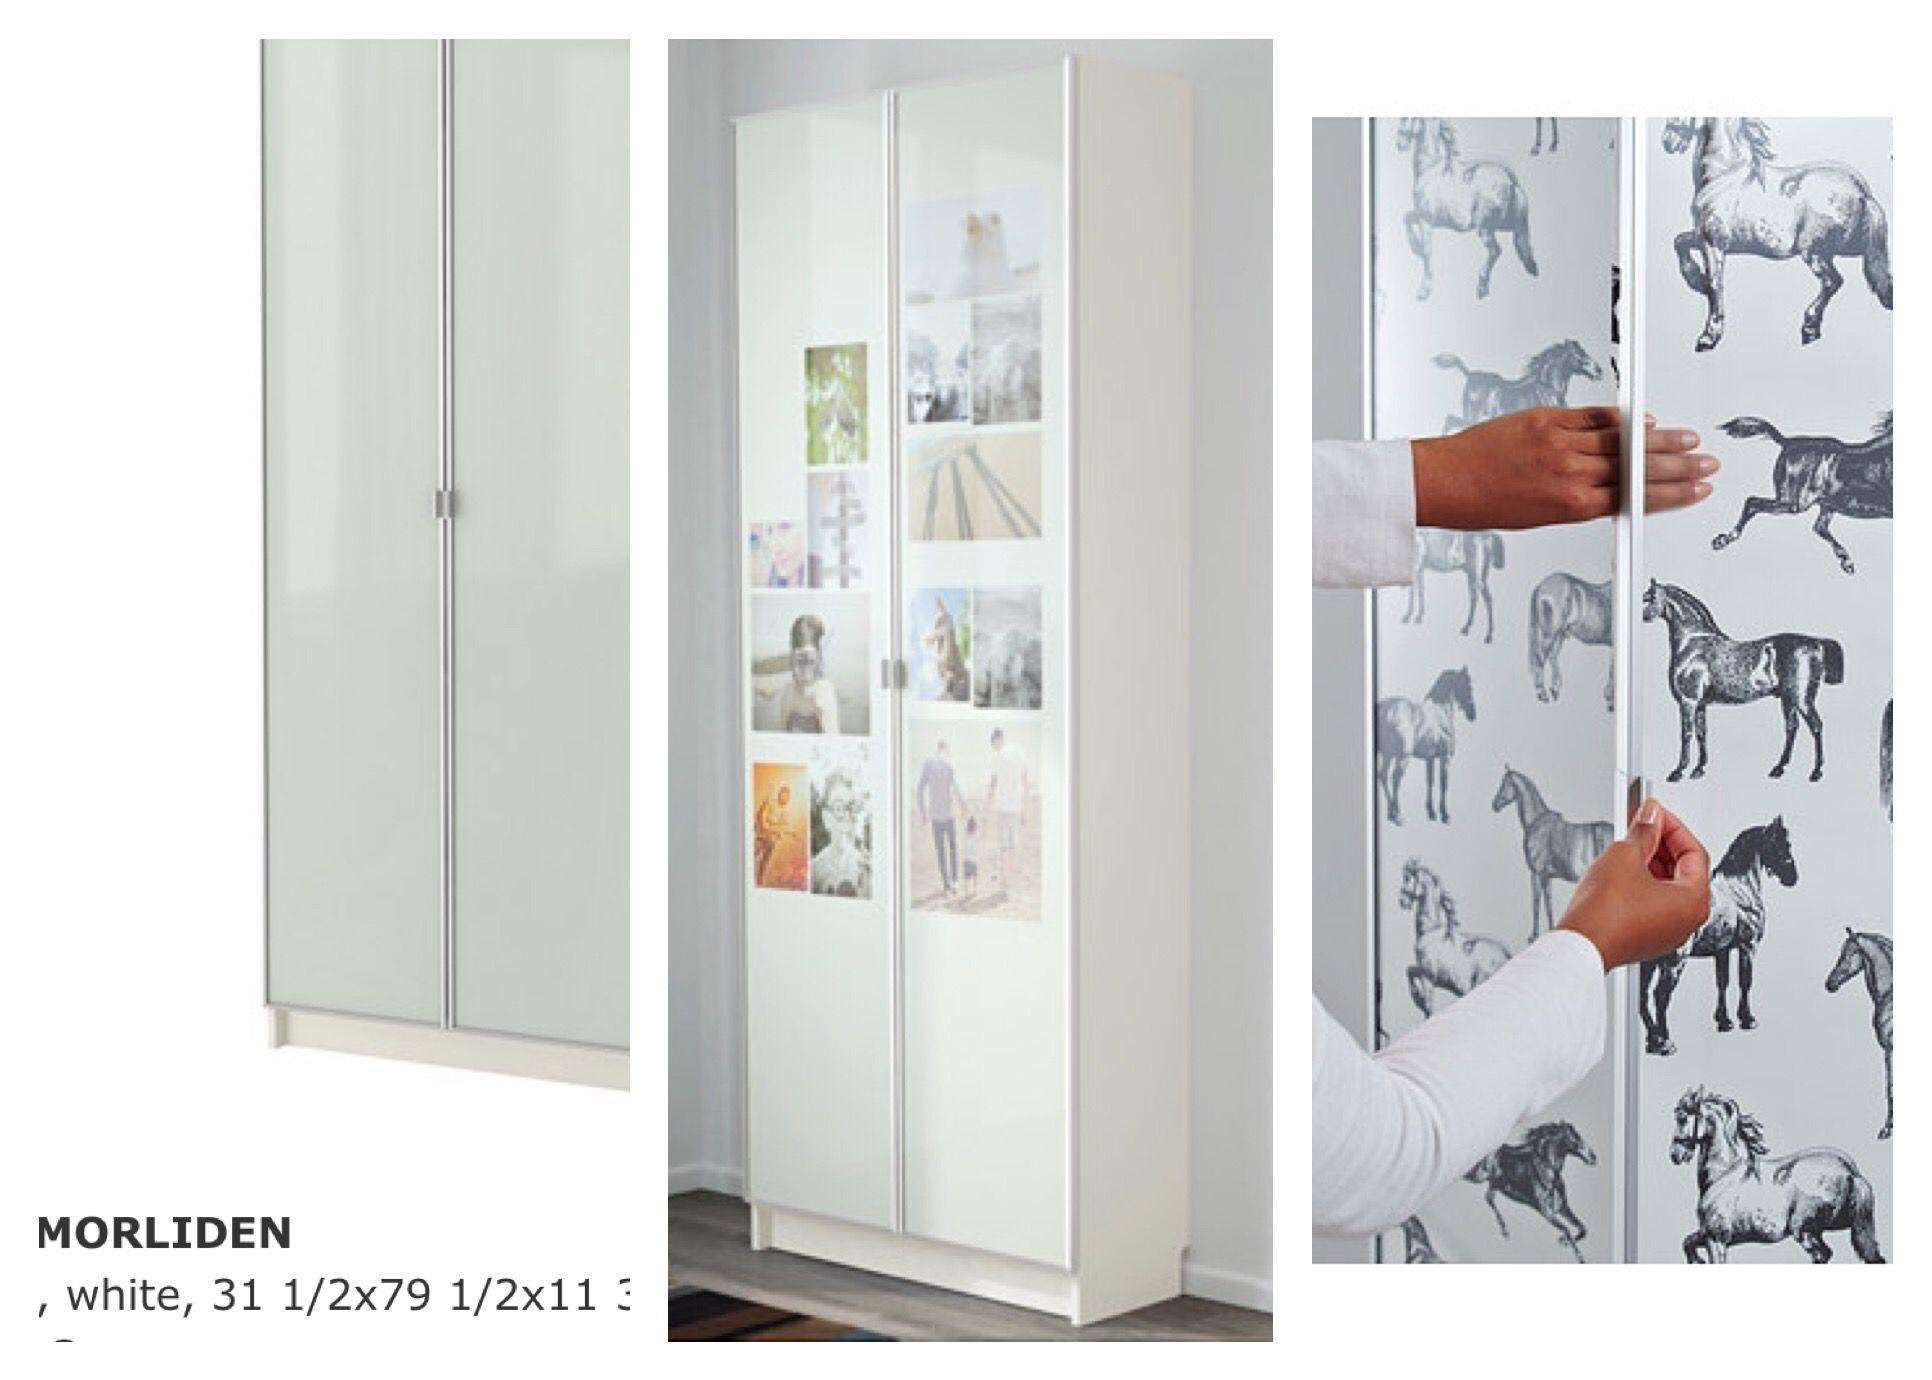 Billy With Morliden Glass Doors With Photos In Them Home Decor Ikea Billy Glass Door